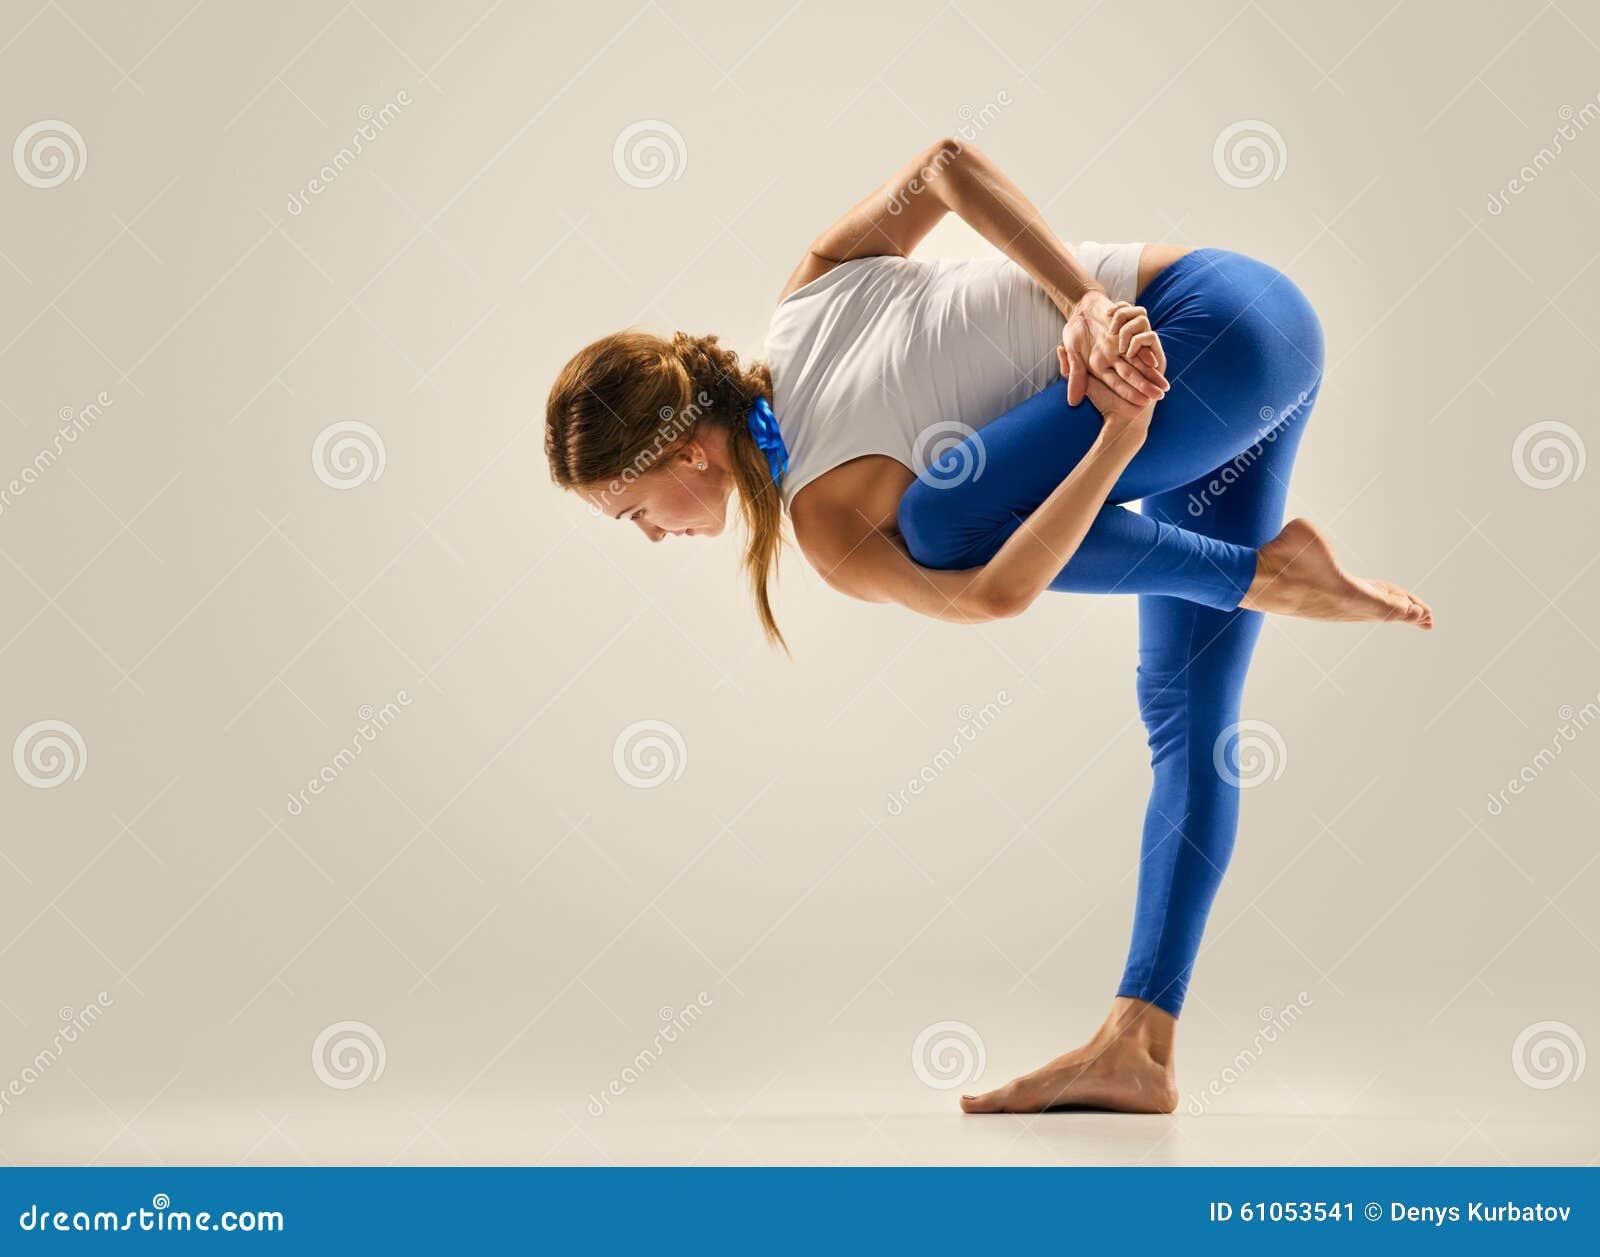 Yoga pose gymnastics stock photo image 61053541 for Floor yoga poses